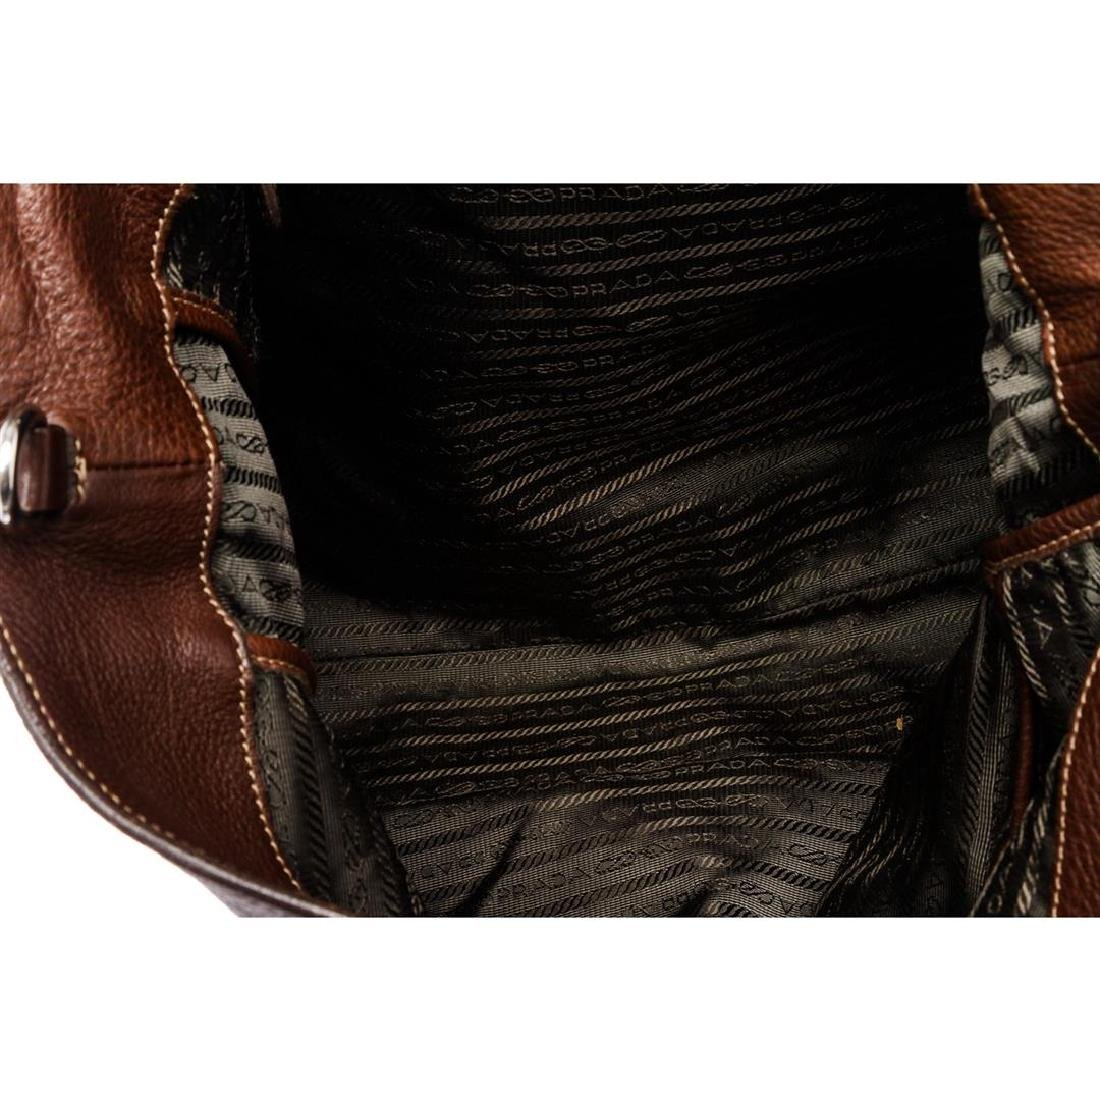 Prada Brown Pebbled Leather Tote Satchel Bag - 7